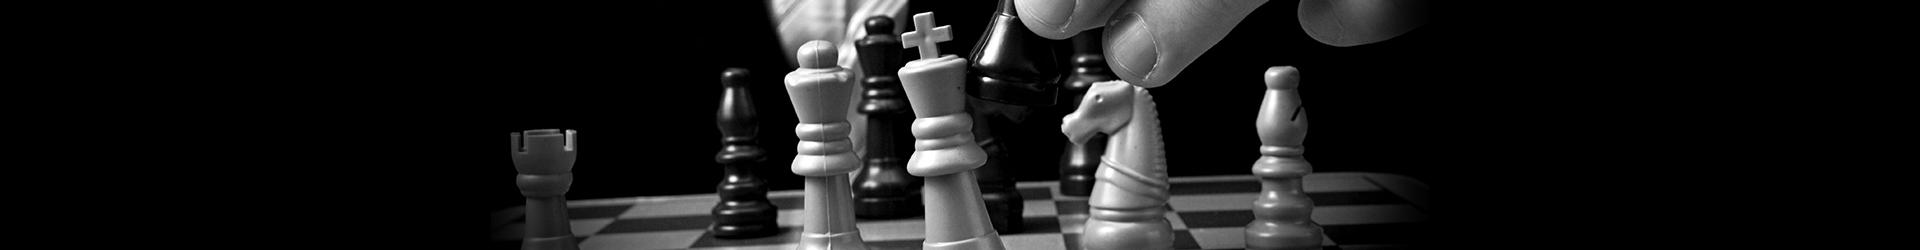 Chess-Move1